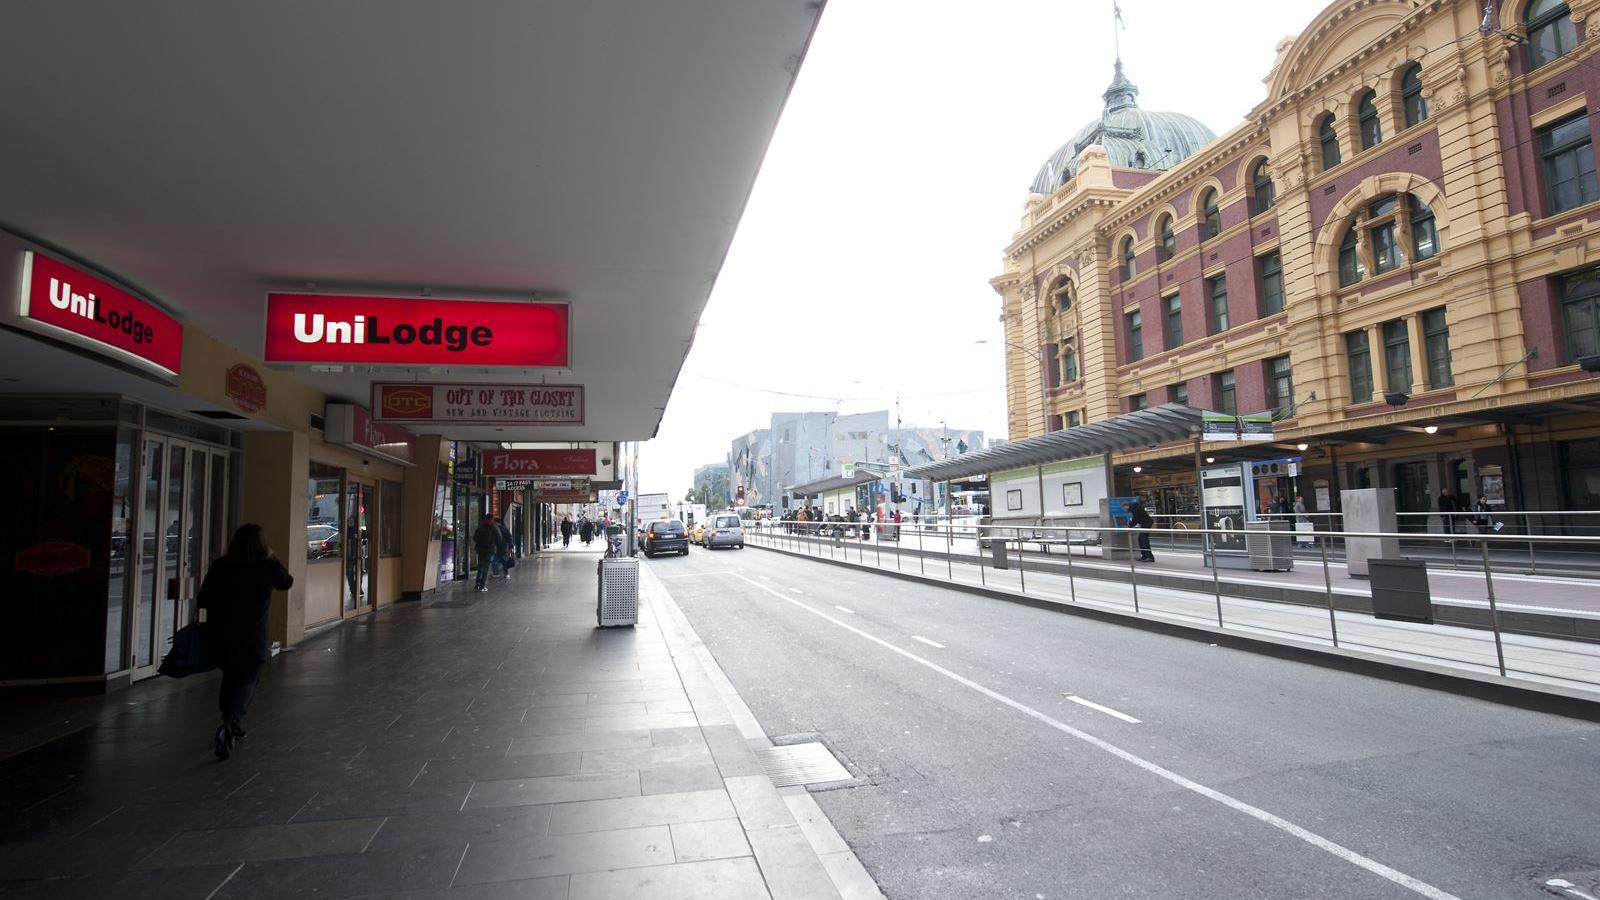 UniLodge on Flinders exterior